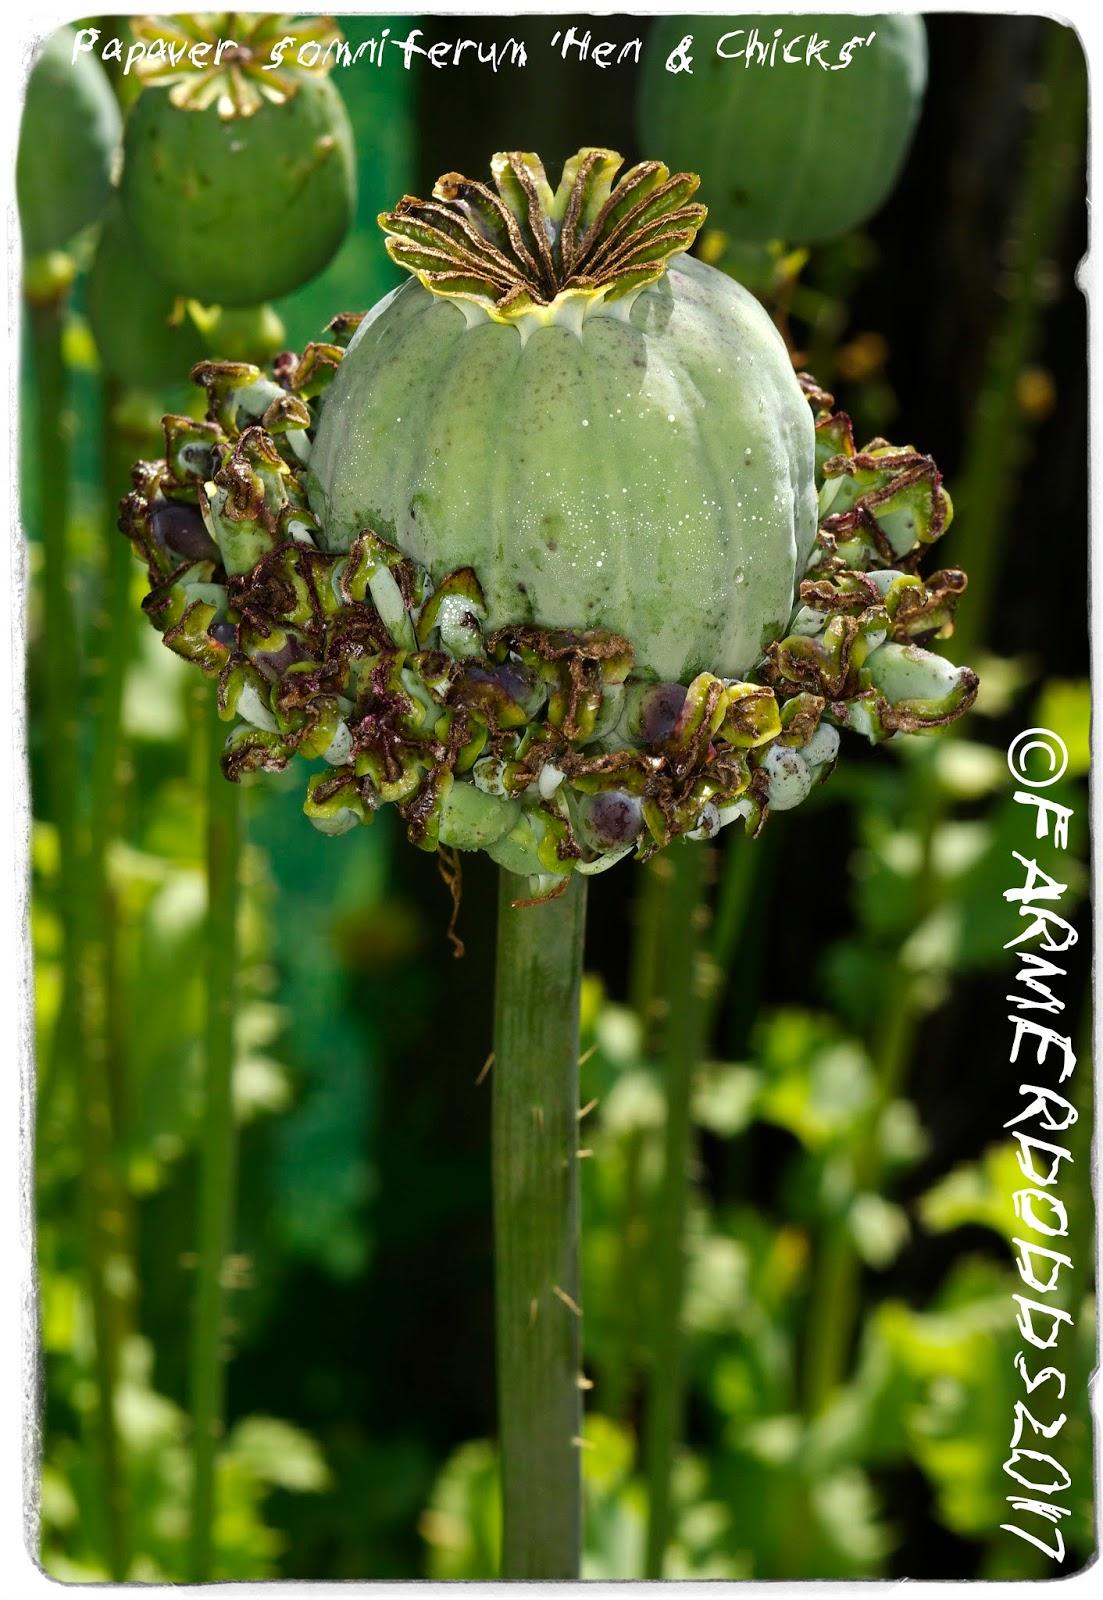 Papaver Somniferum Seeds